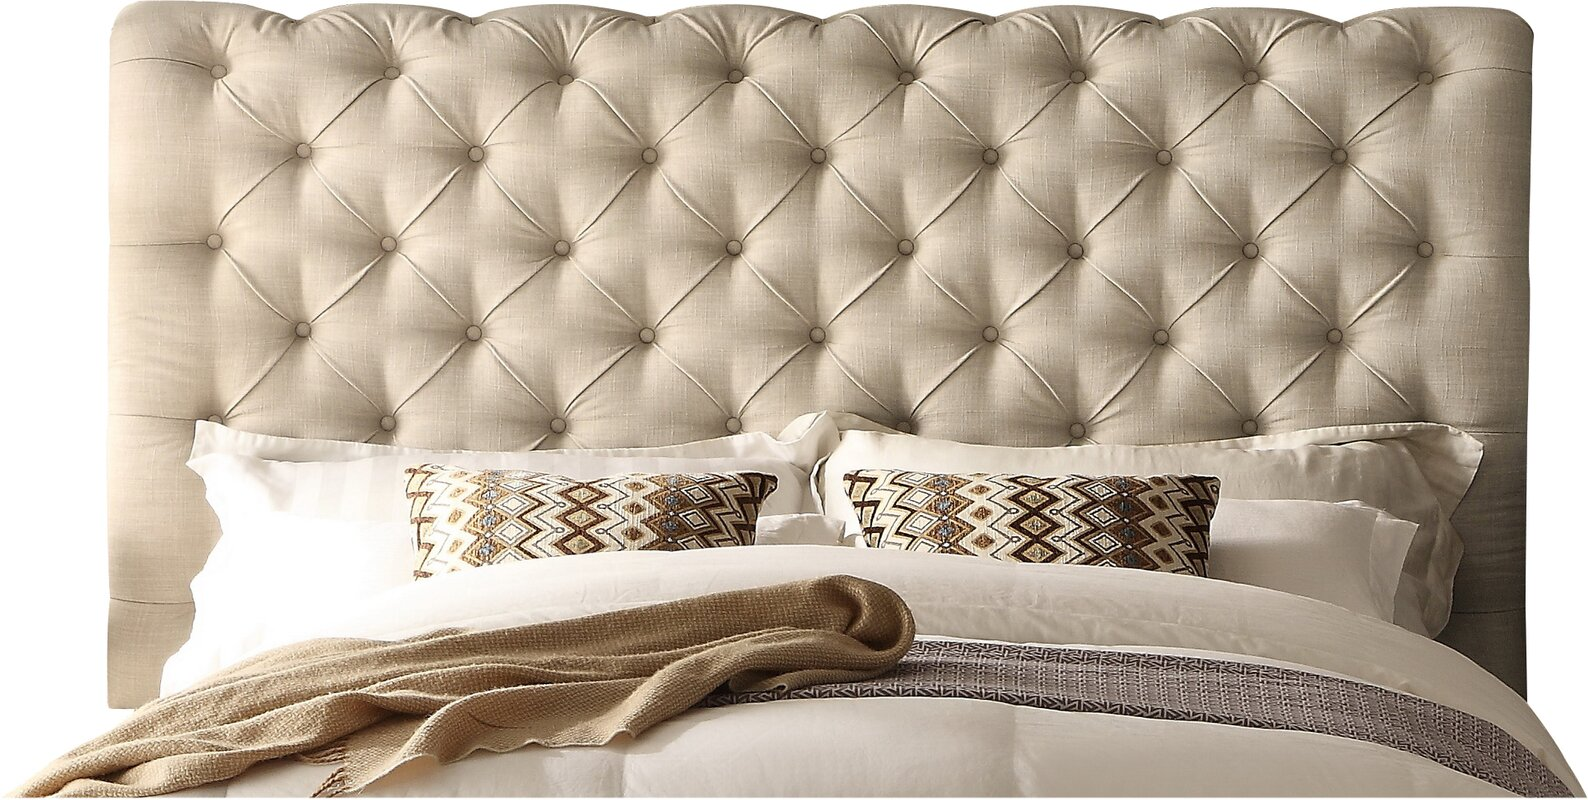 Mulhouse Furniture Calia Queen Upholstered Panel Headboard